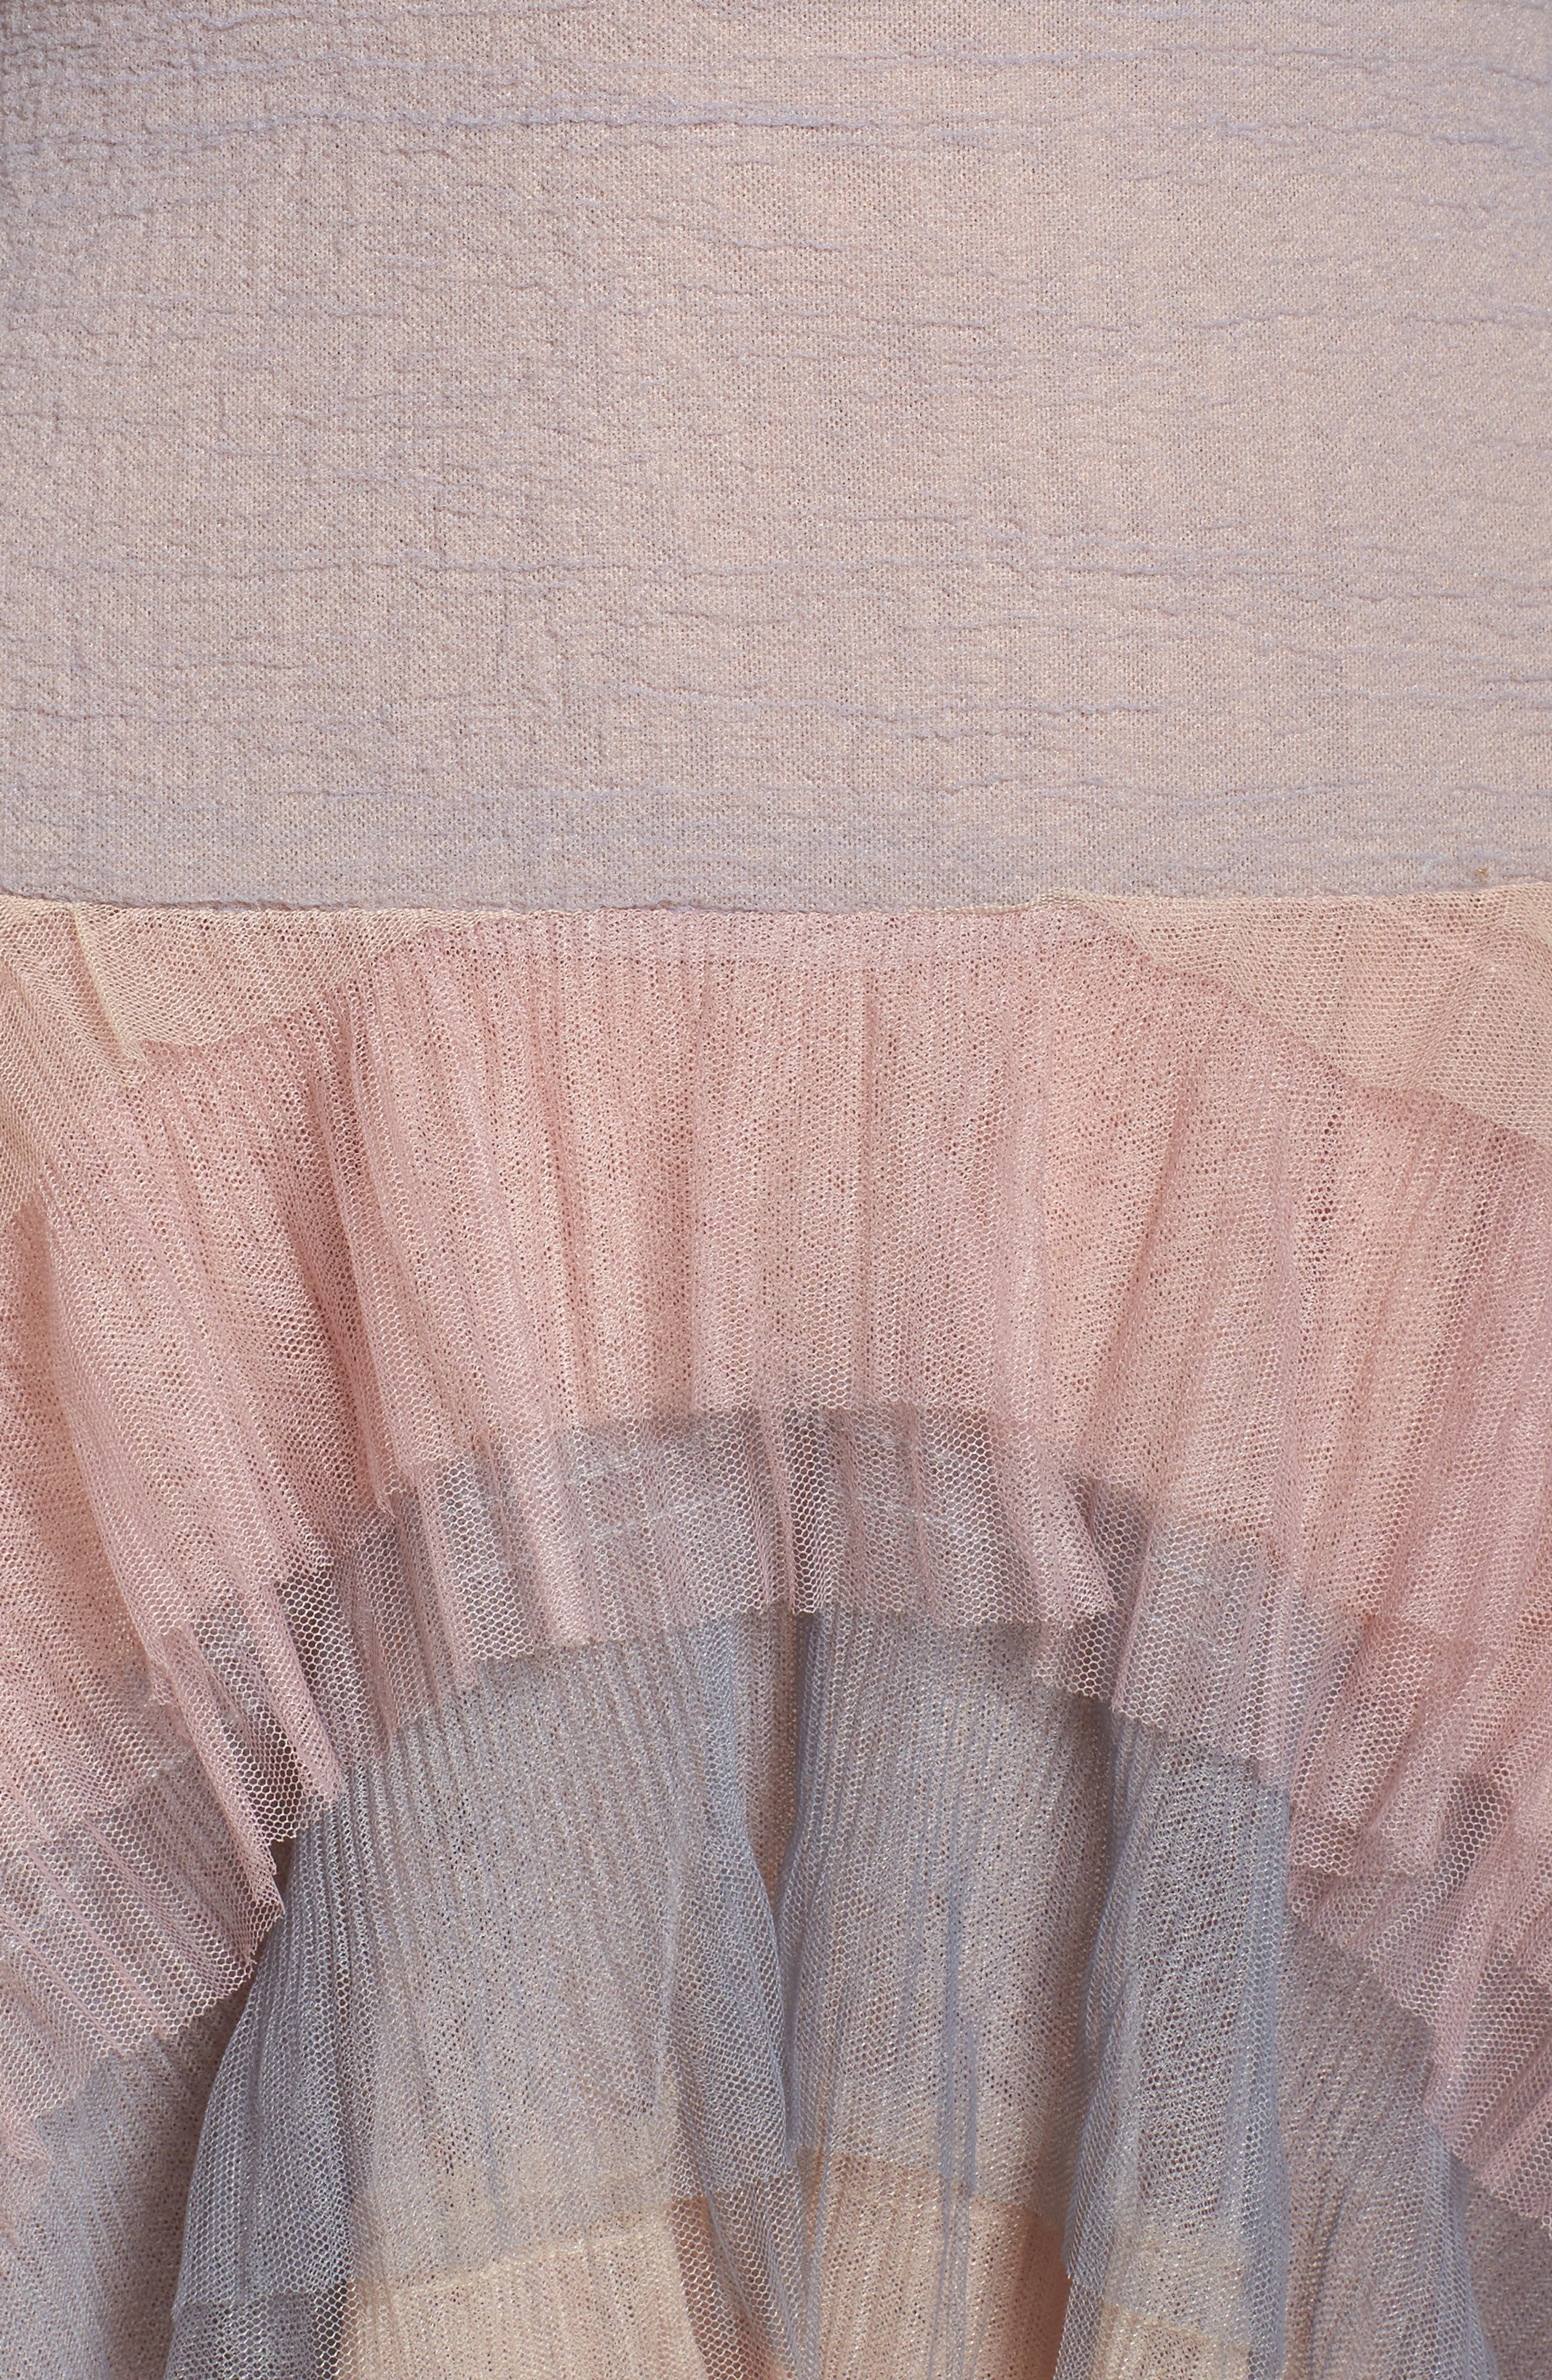 Amelia Tier Ruffle Gown,                             Alternate thumbnail 5, color,                             MULTICOLOR